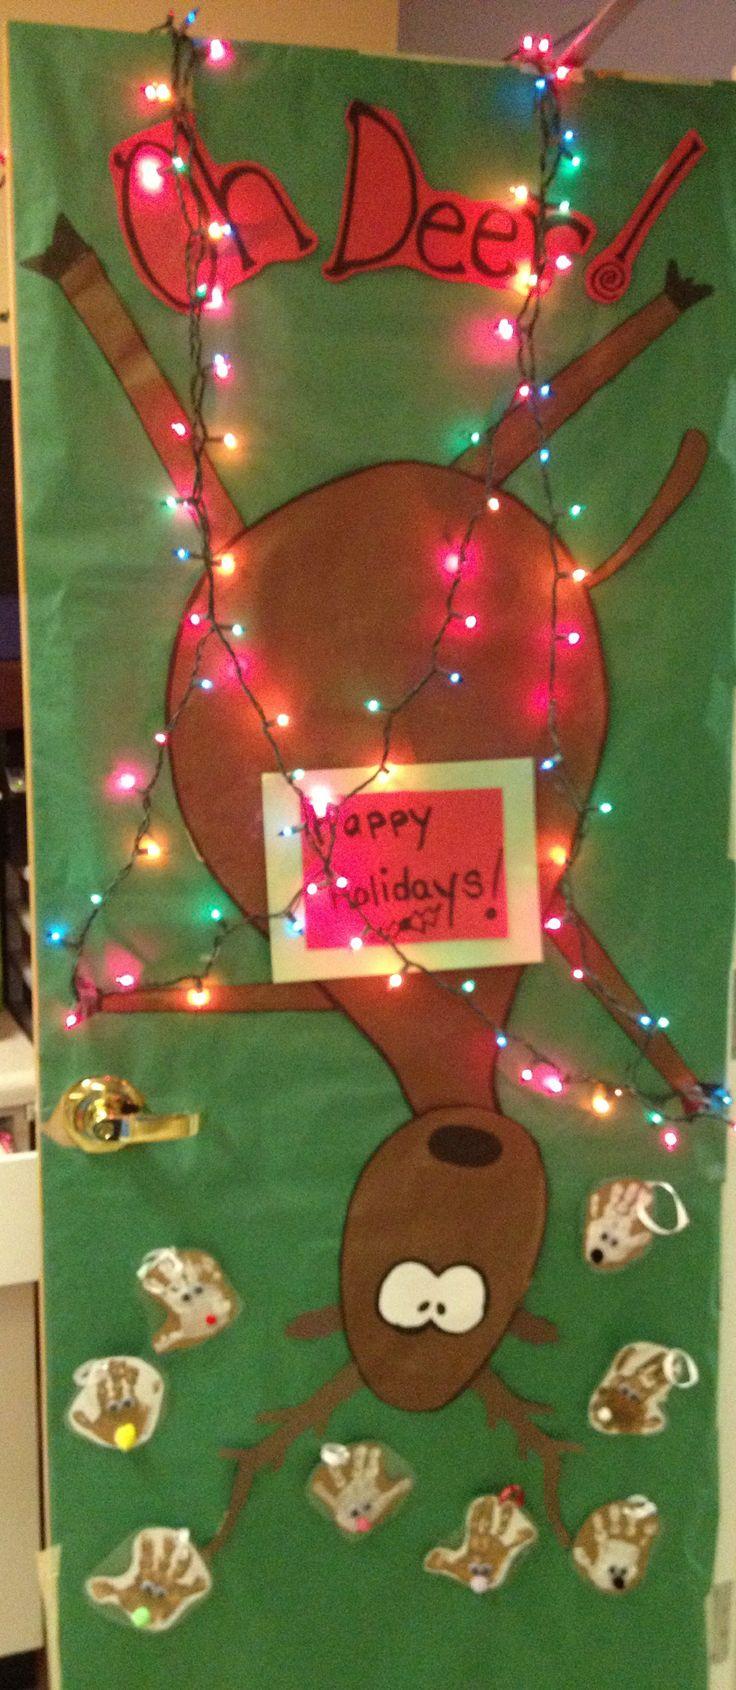 Christmas Door Decorations For Preschool Decoration Wall Ideas